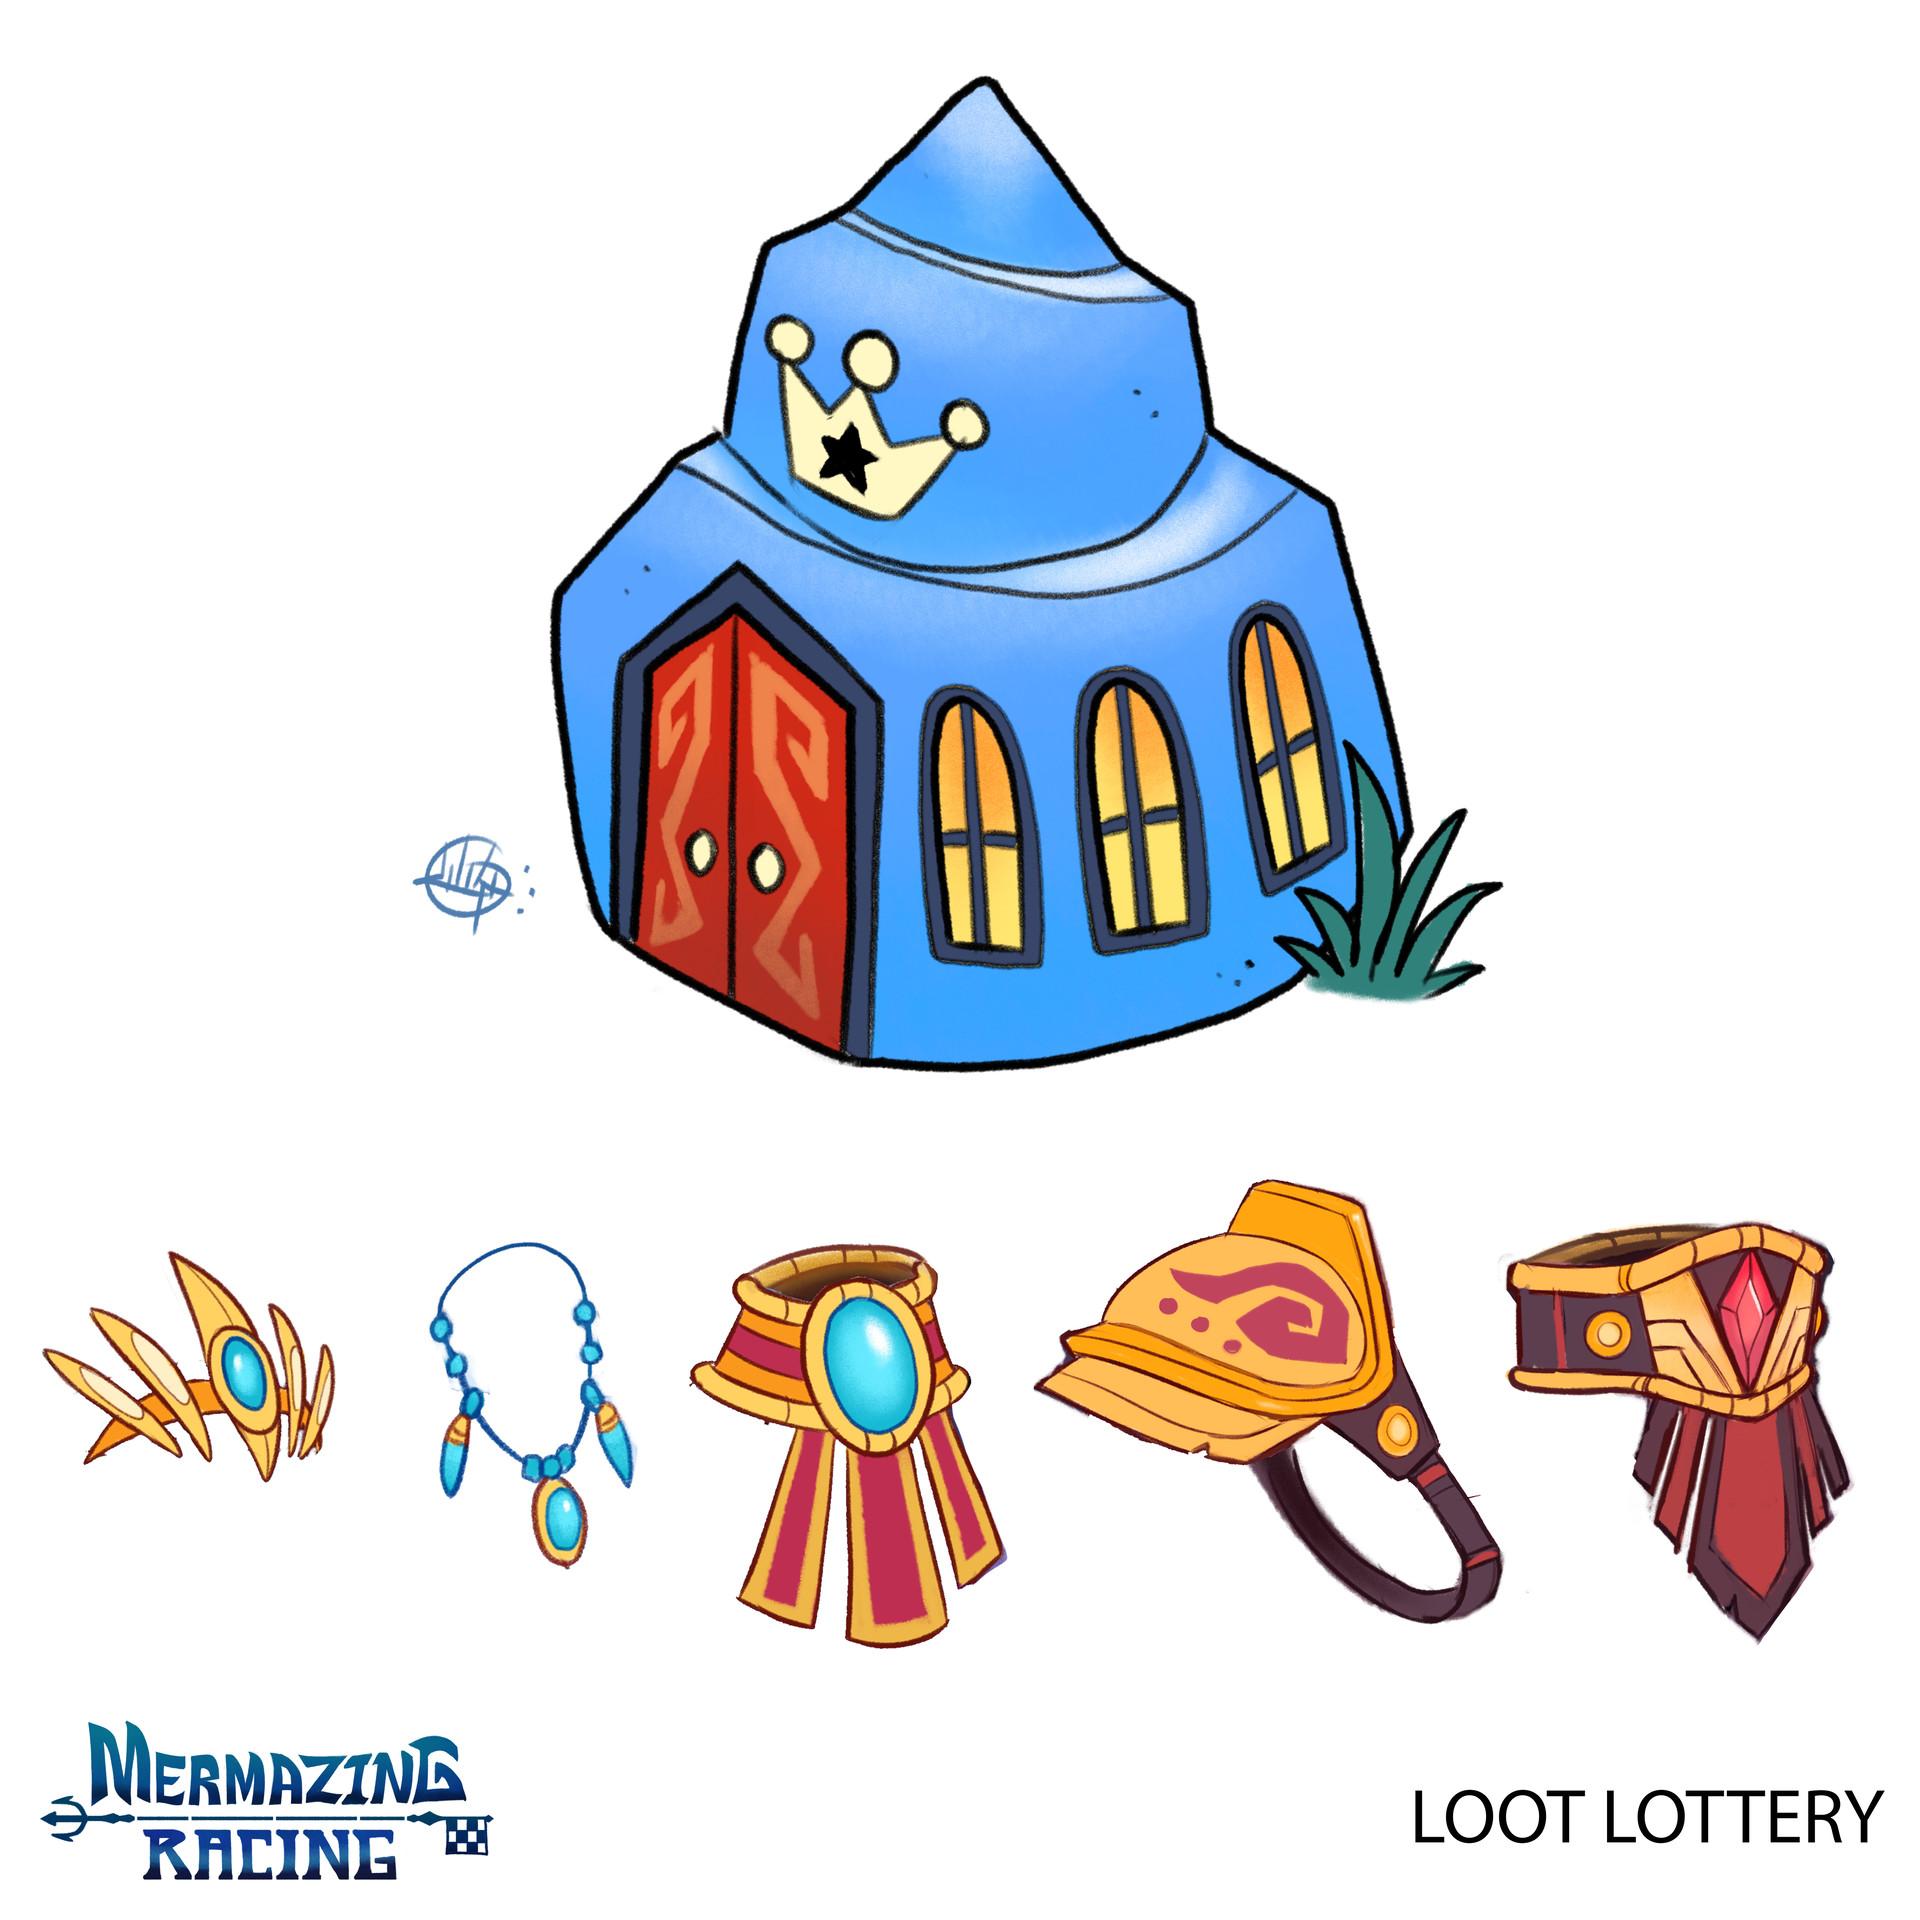 Luigi lucarelli loot lottery